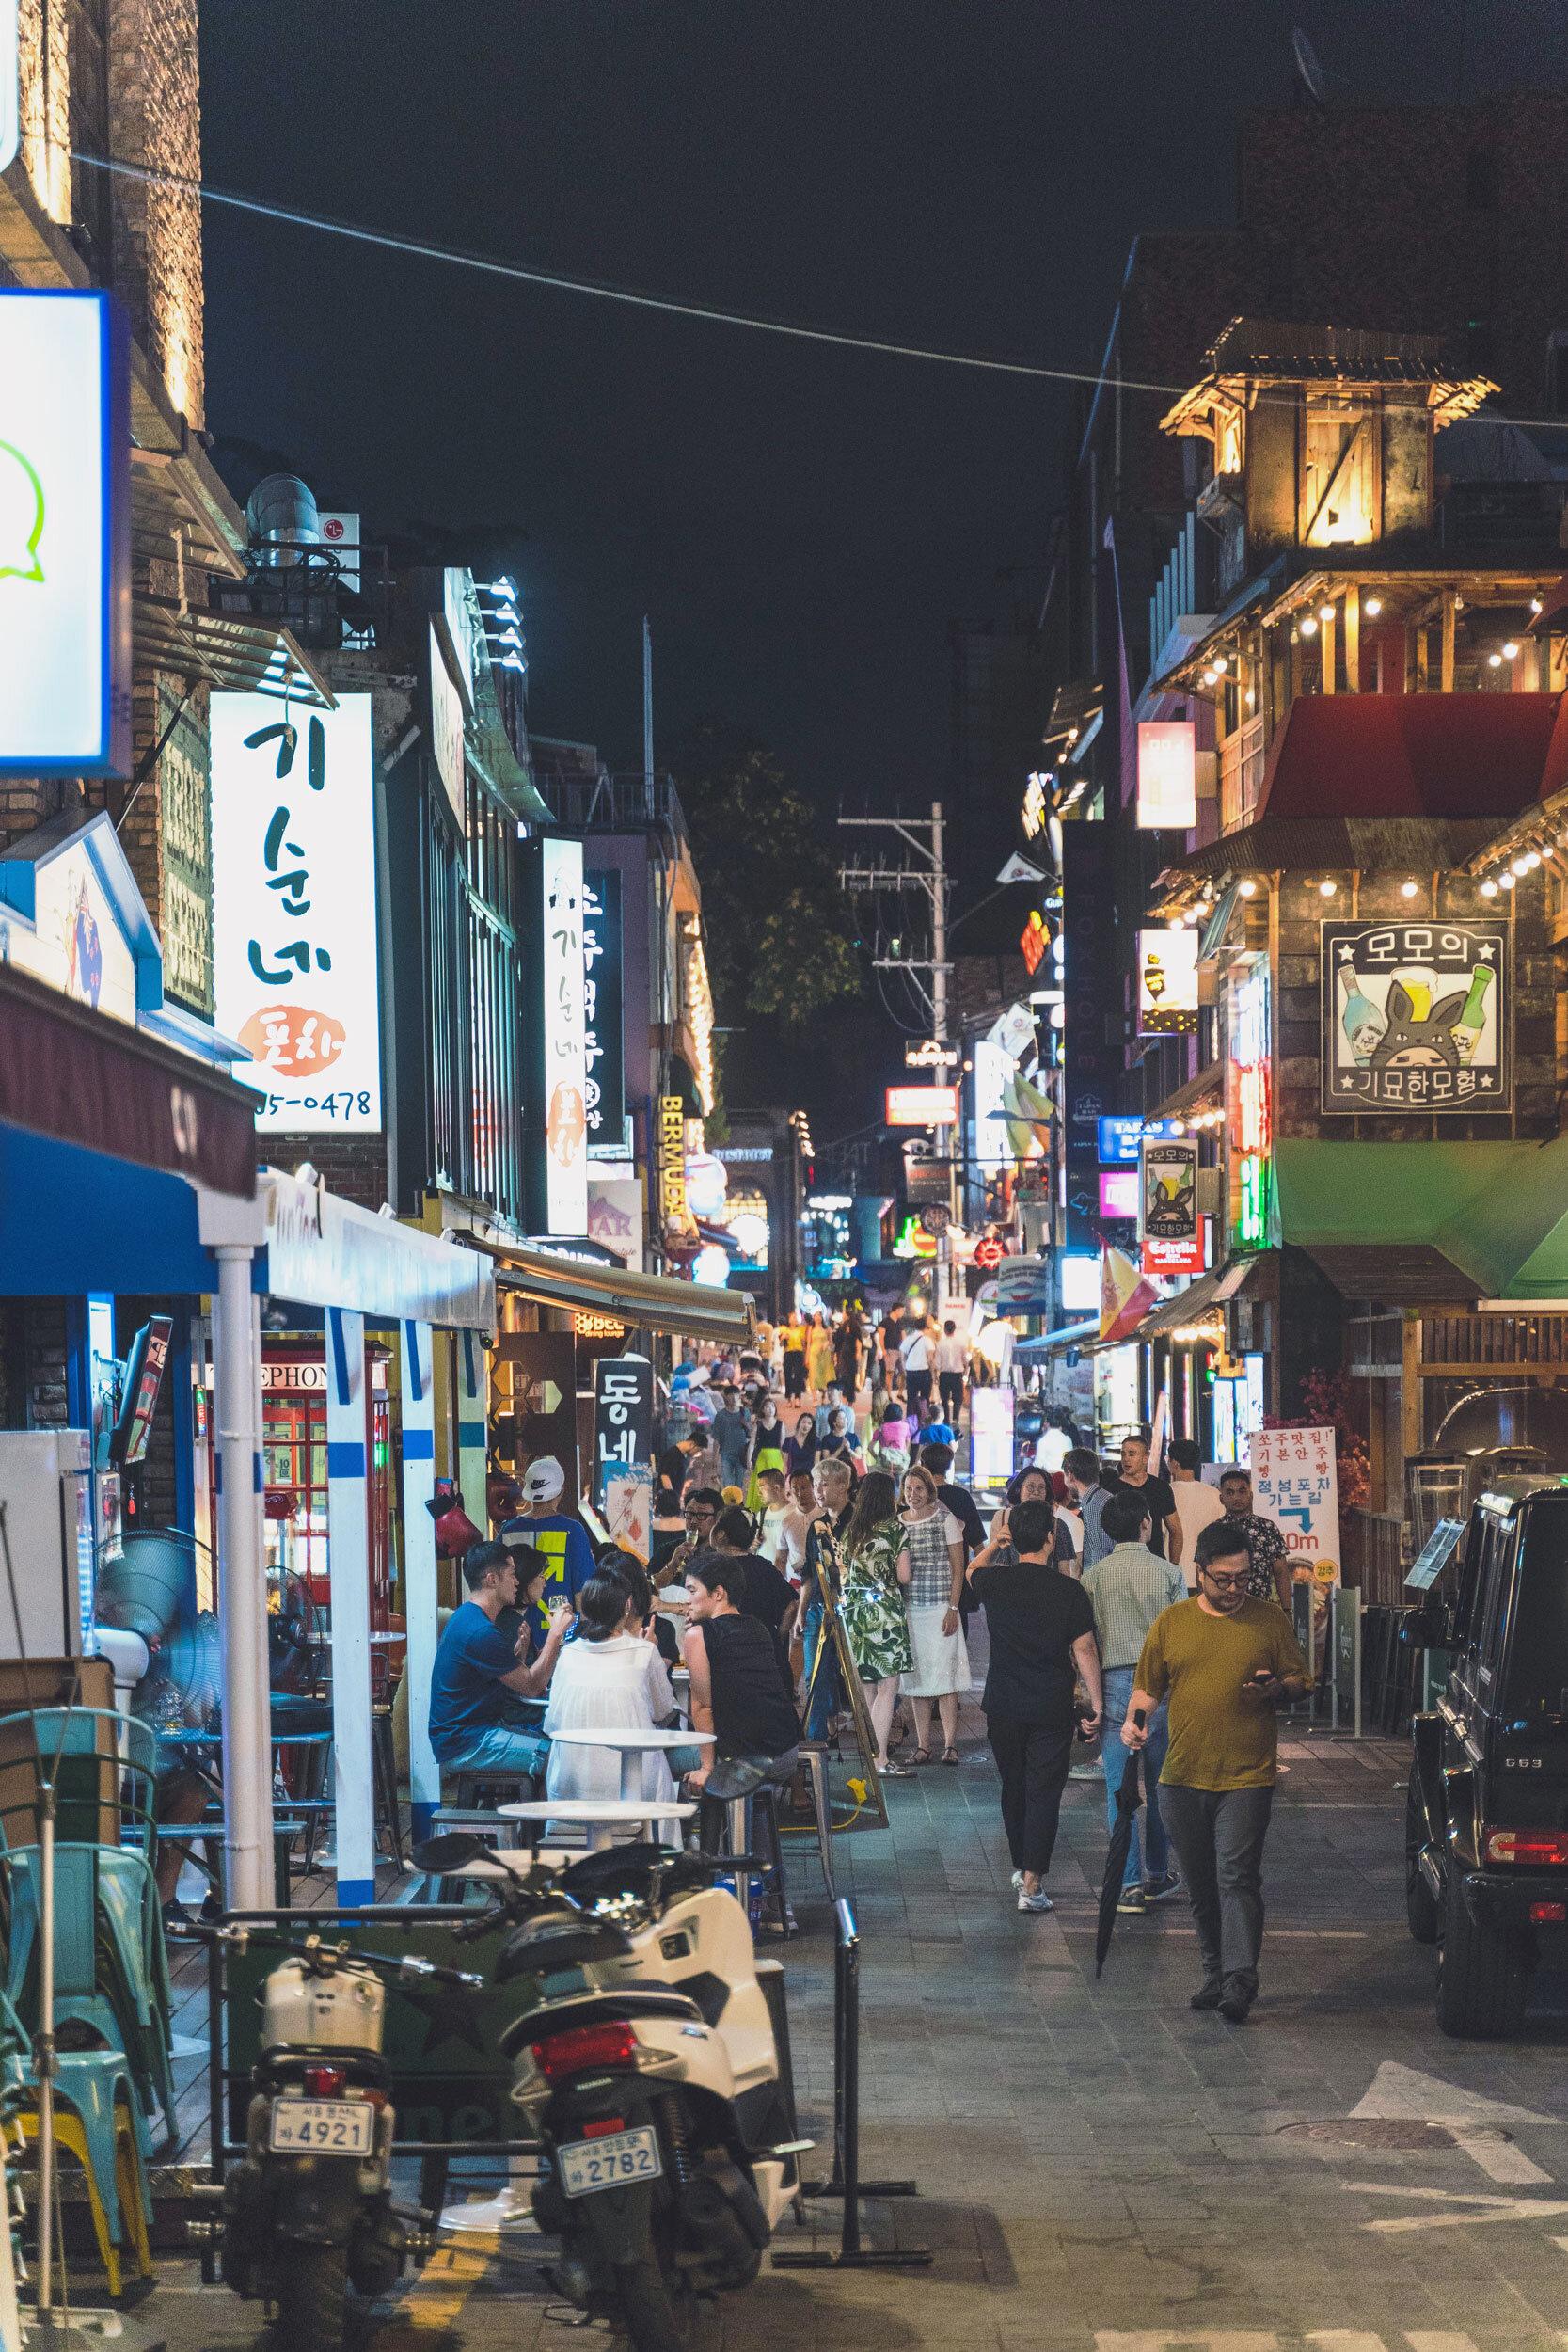 A buzzing street in Itaewon